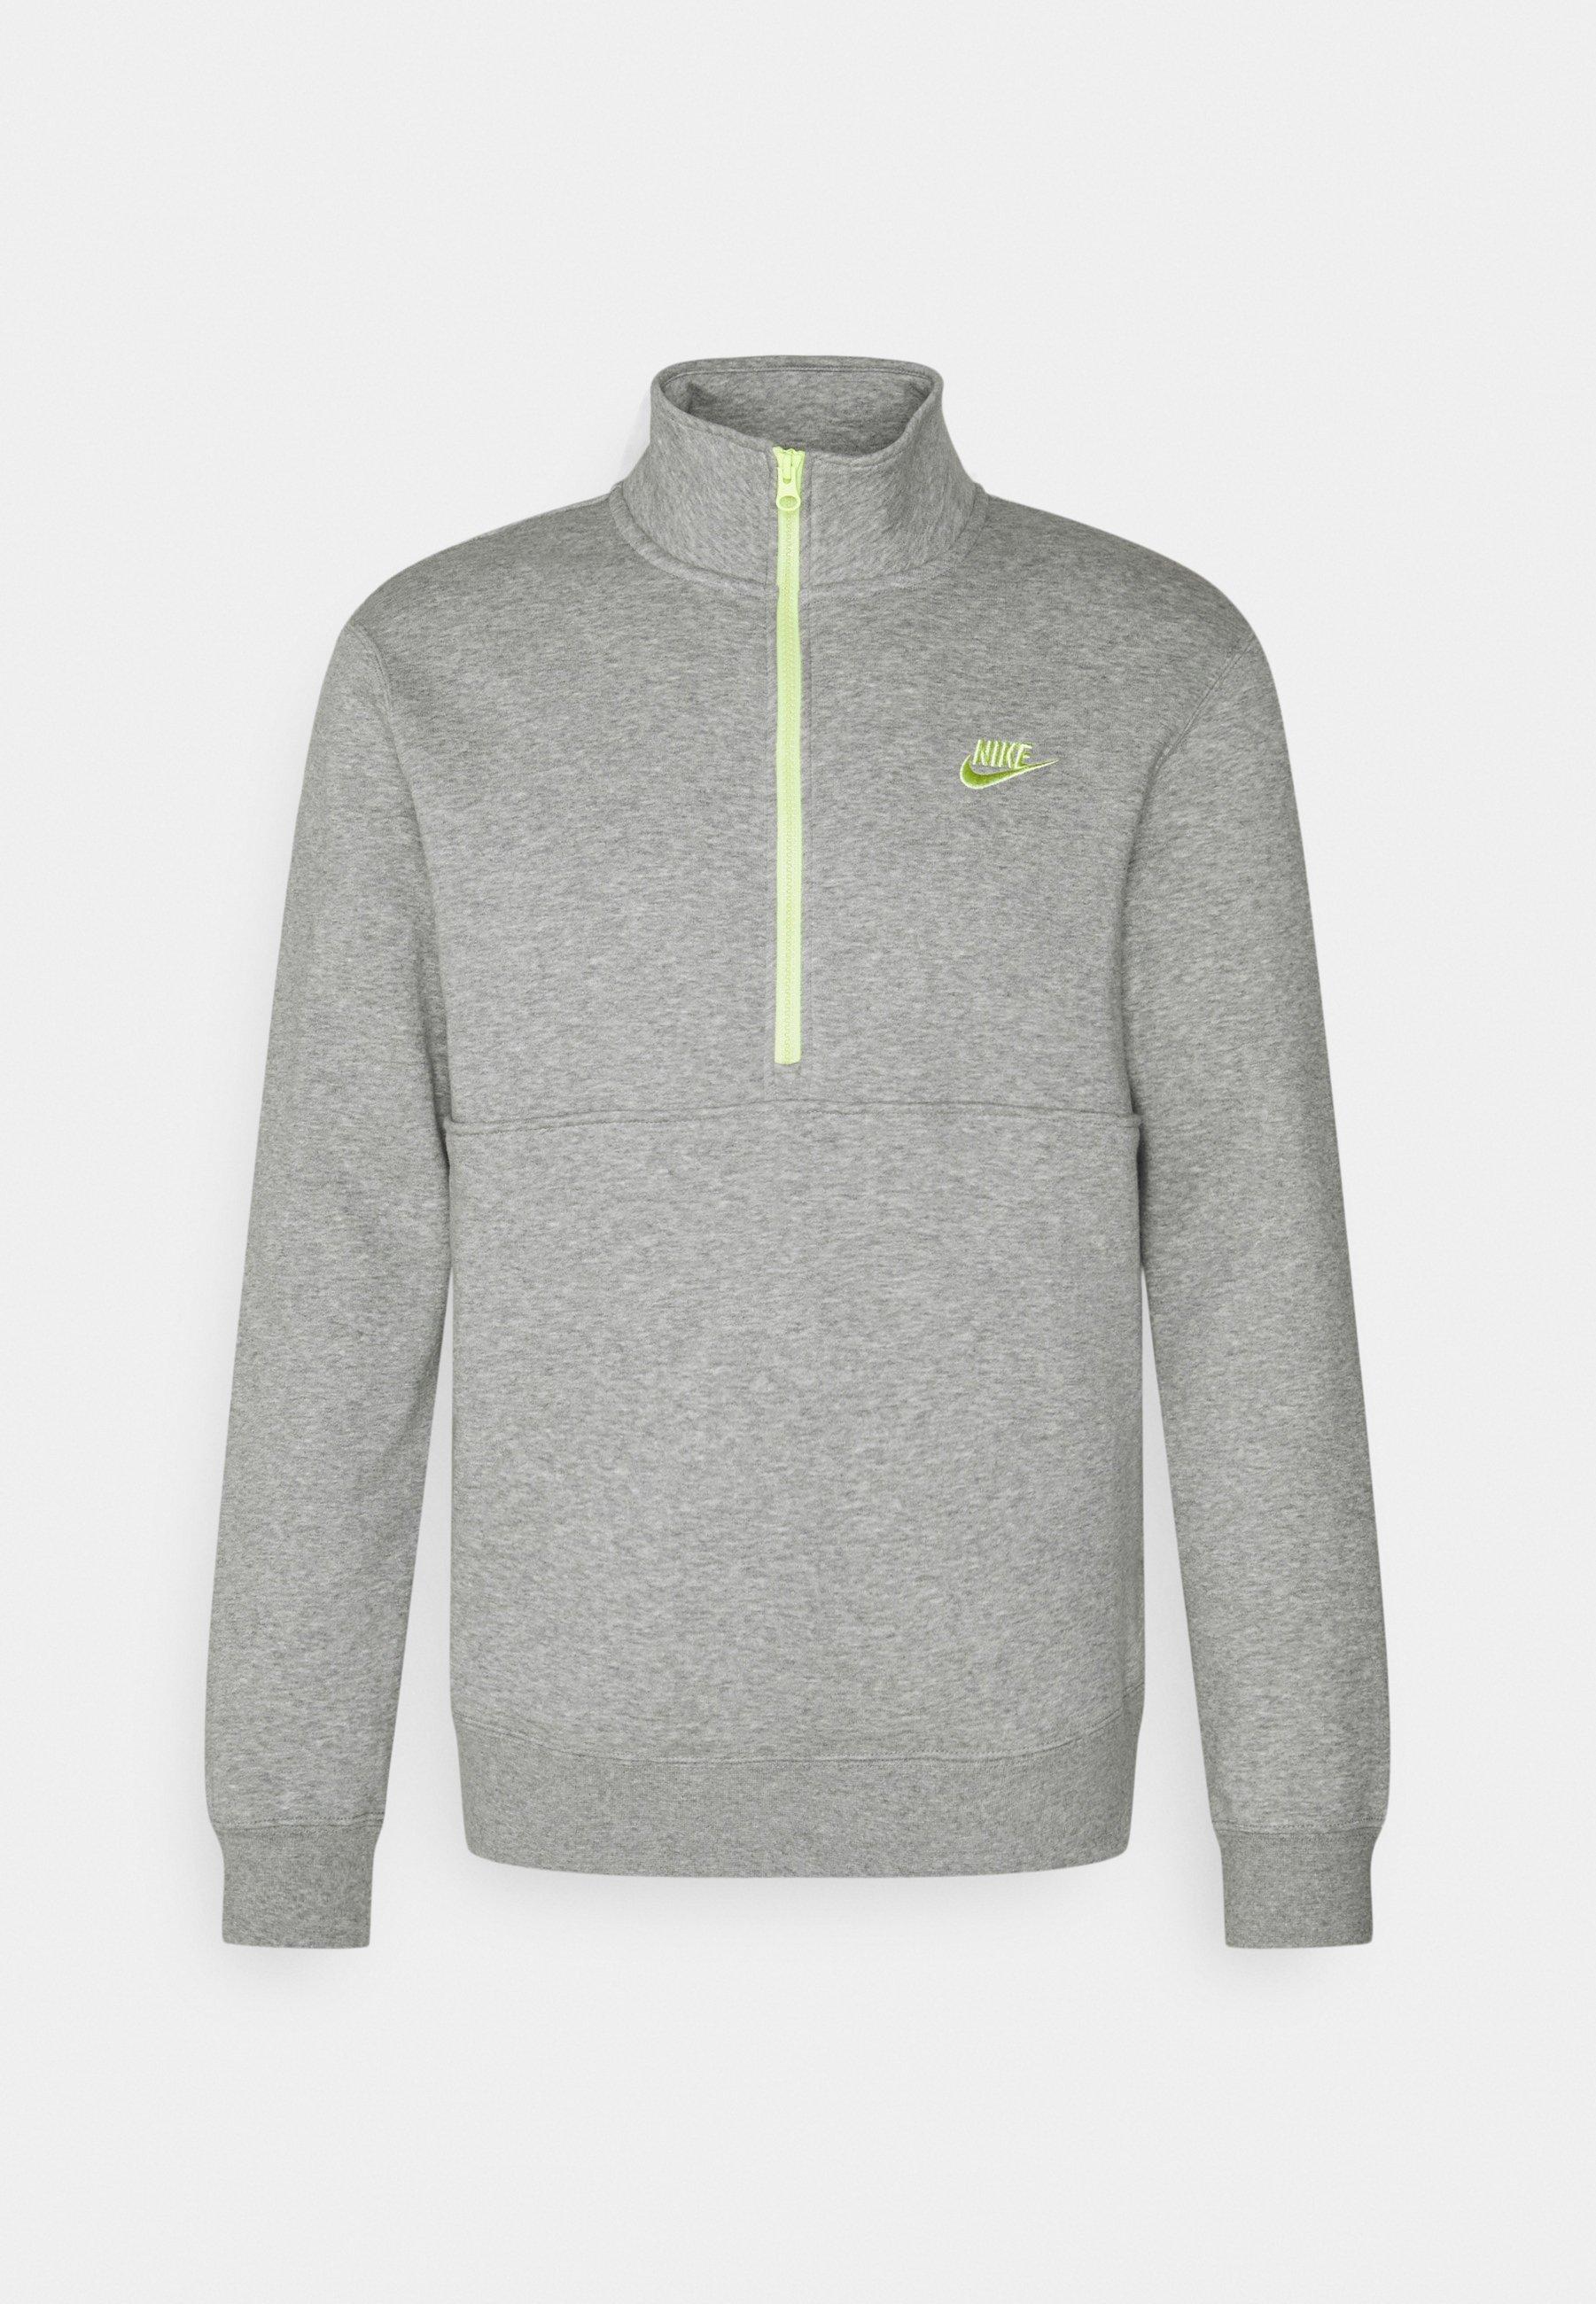 Homme CLUB - Sweatshirt